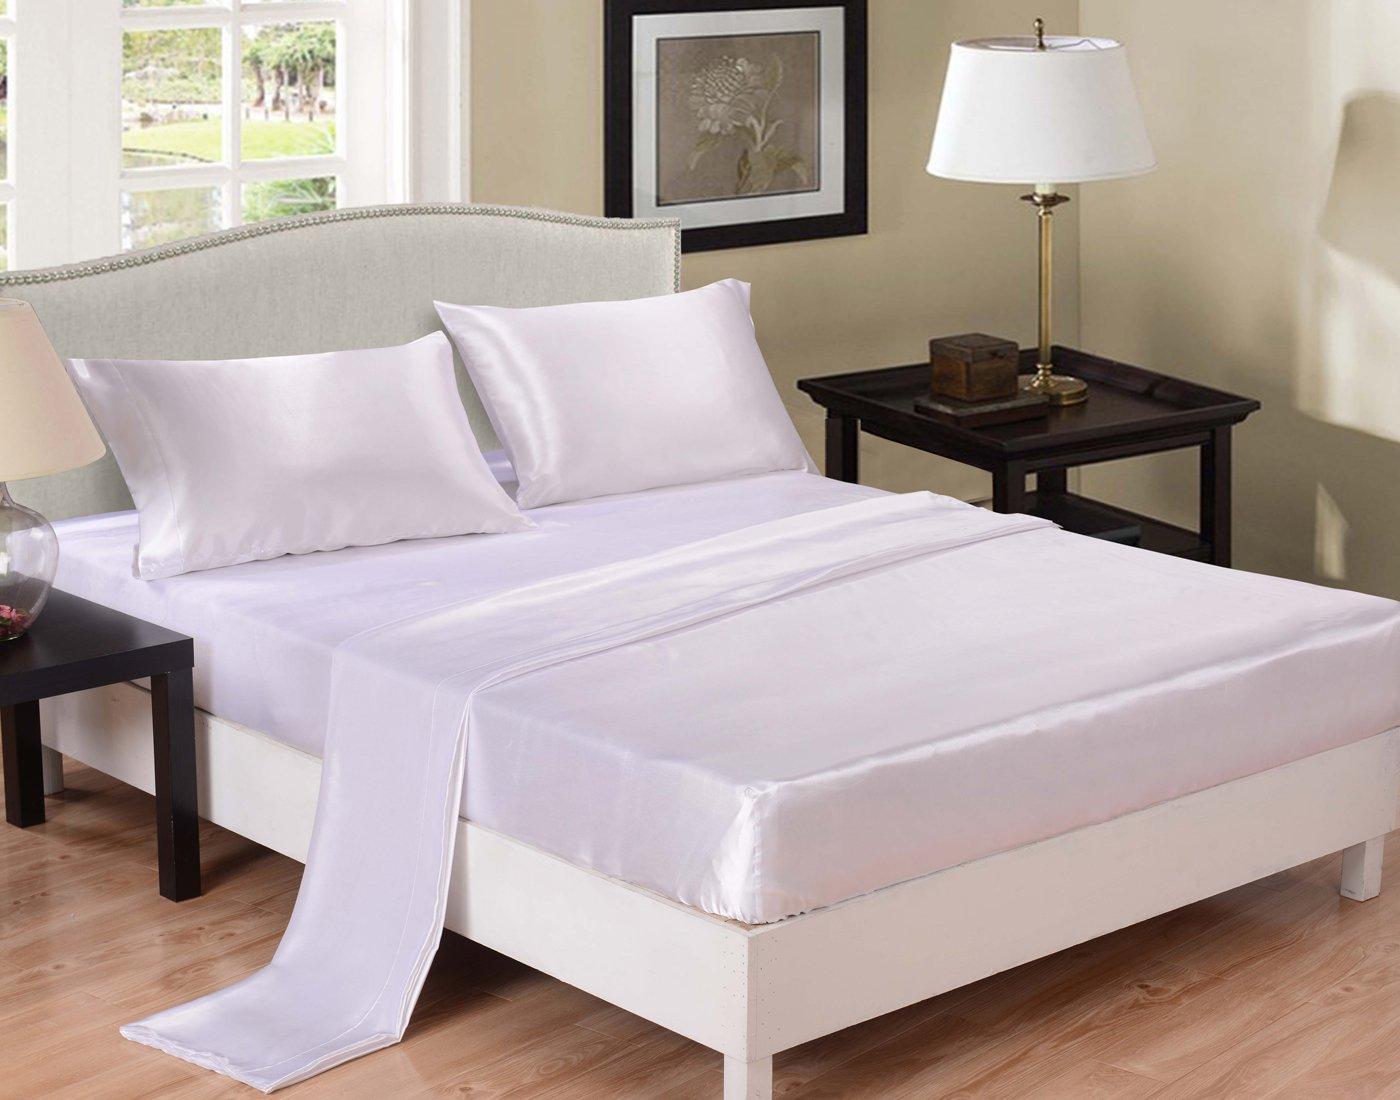 Amazon.com: Honeymoon Ultra Silky Soft Satin Queen Bed Sheet Set   White:  Home U0026 Kitchen